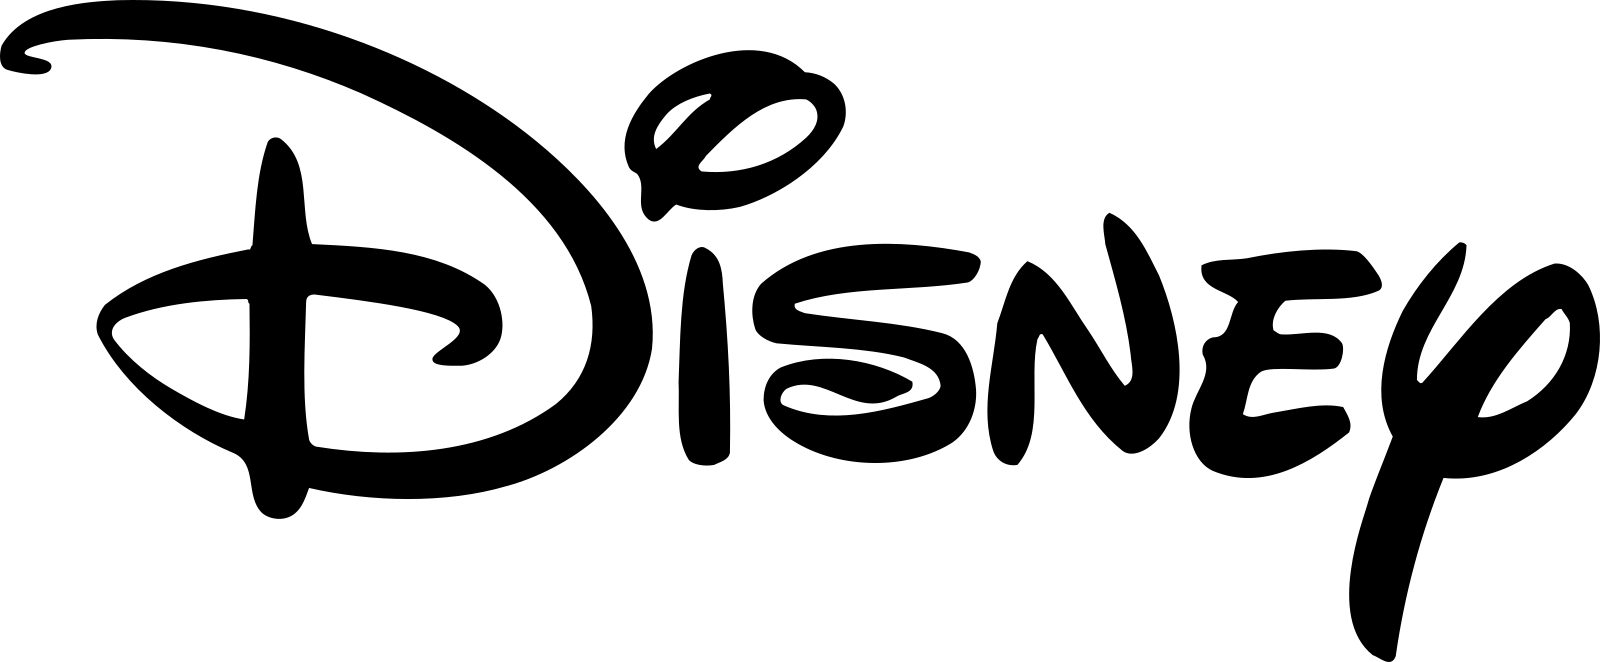 disney logo 2 - Disney Logo